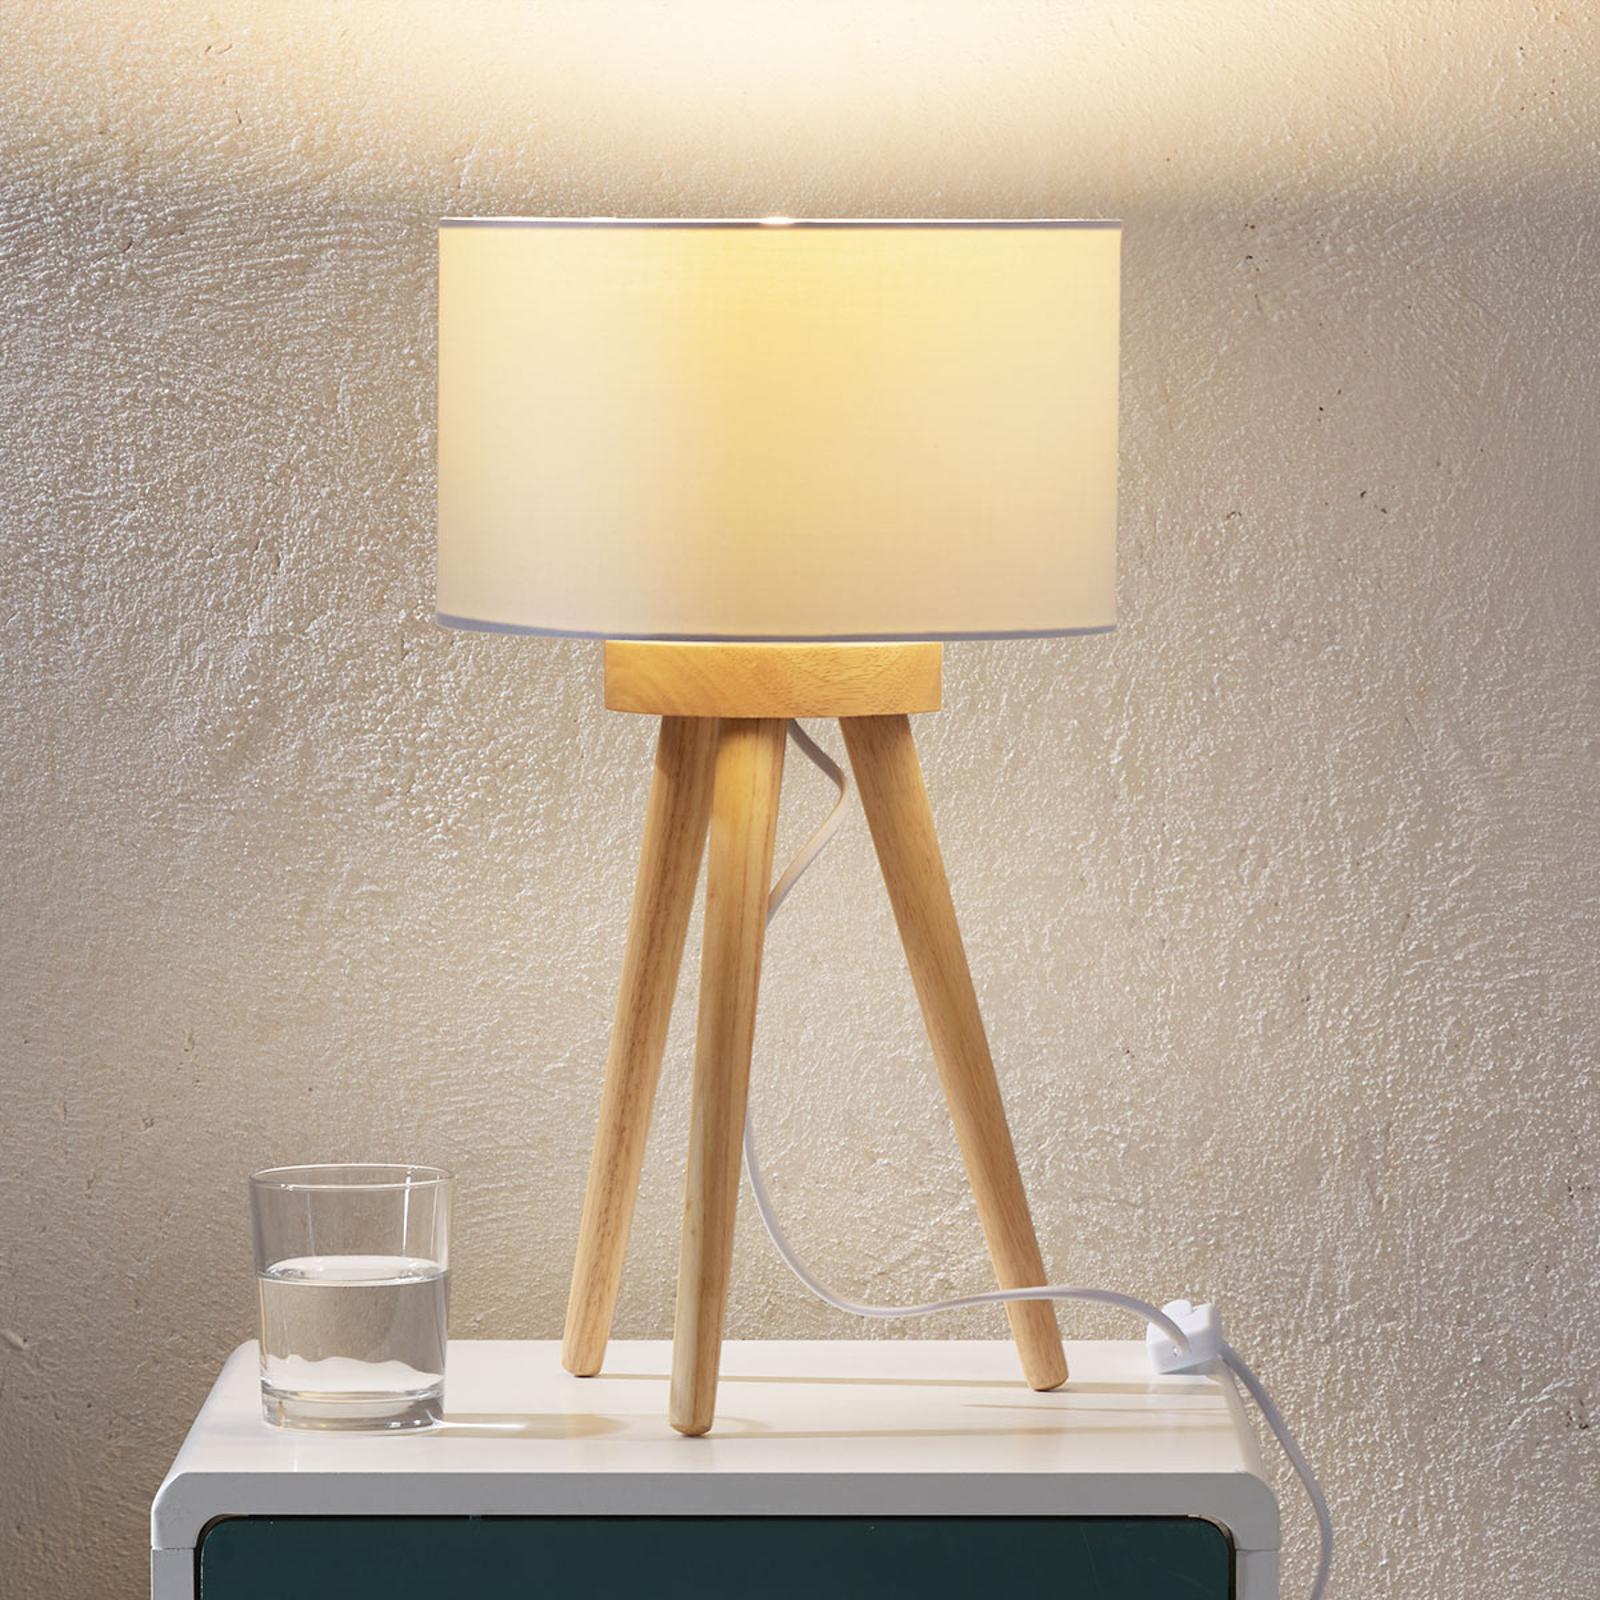 Charlia træbordlampe med hvid stofskærm